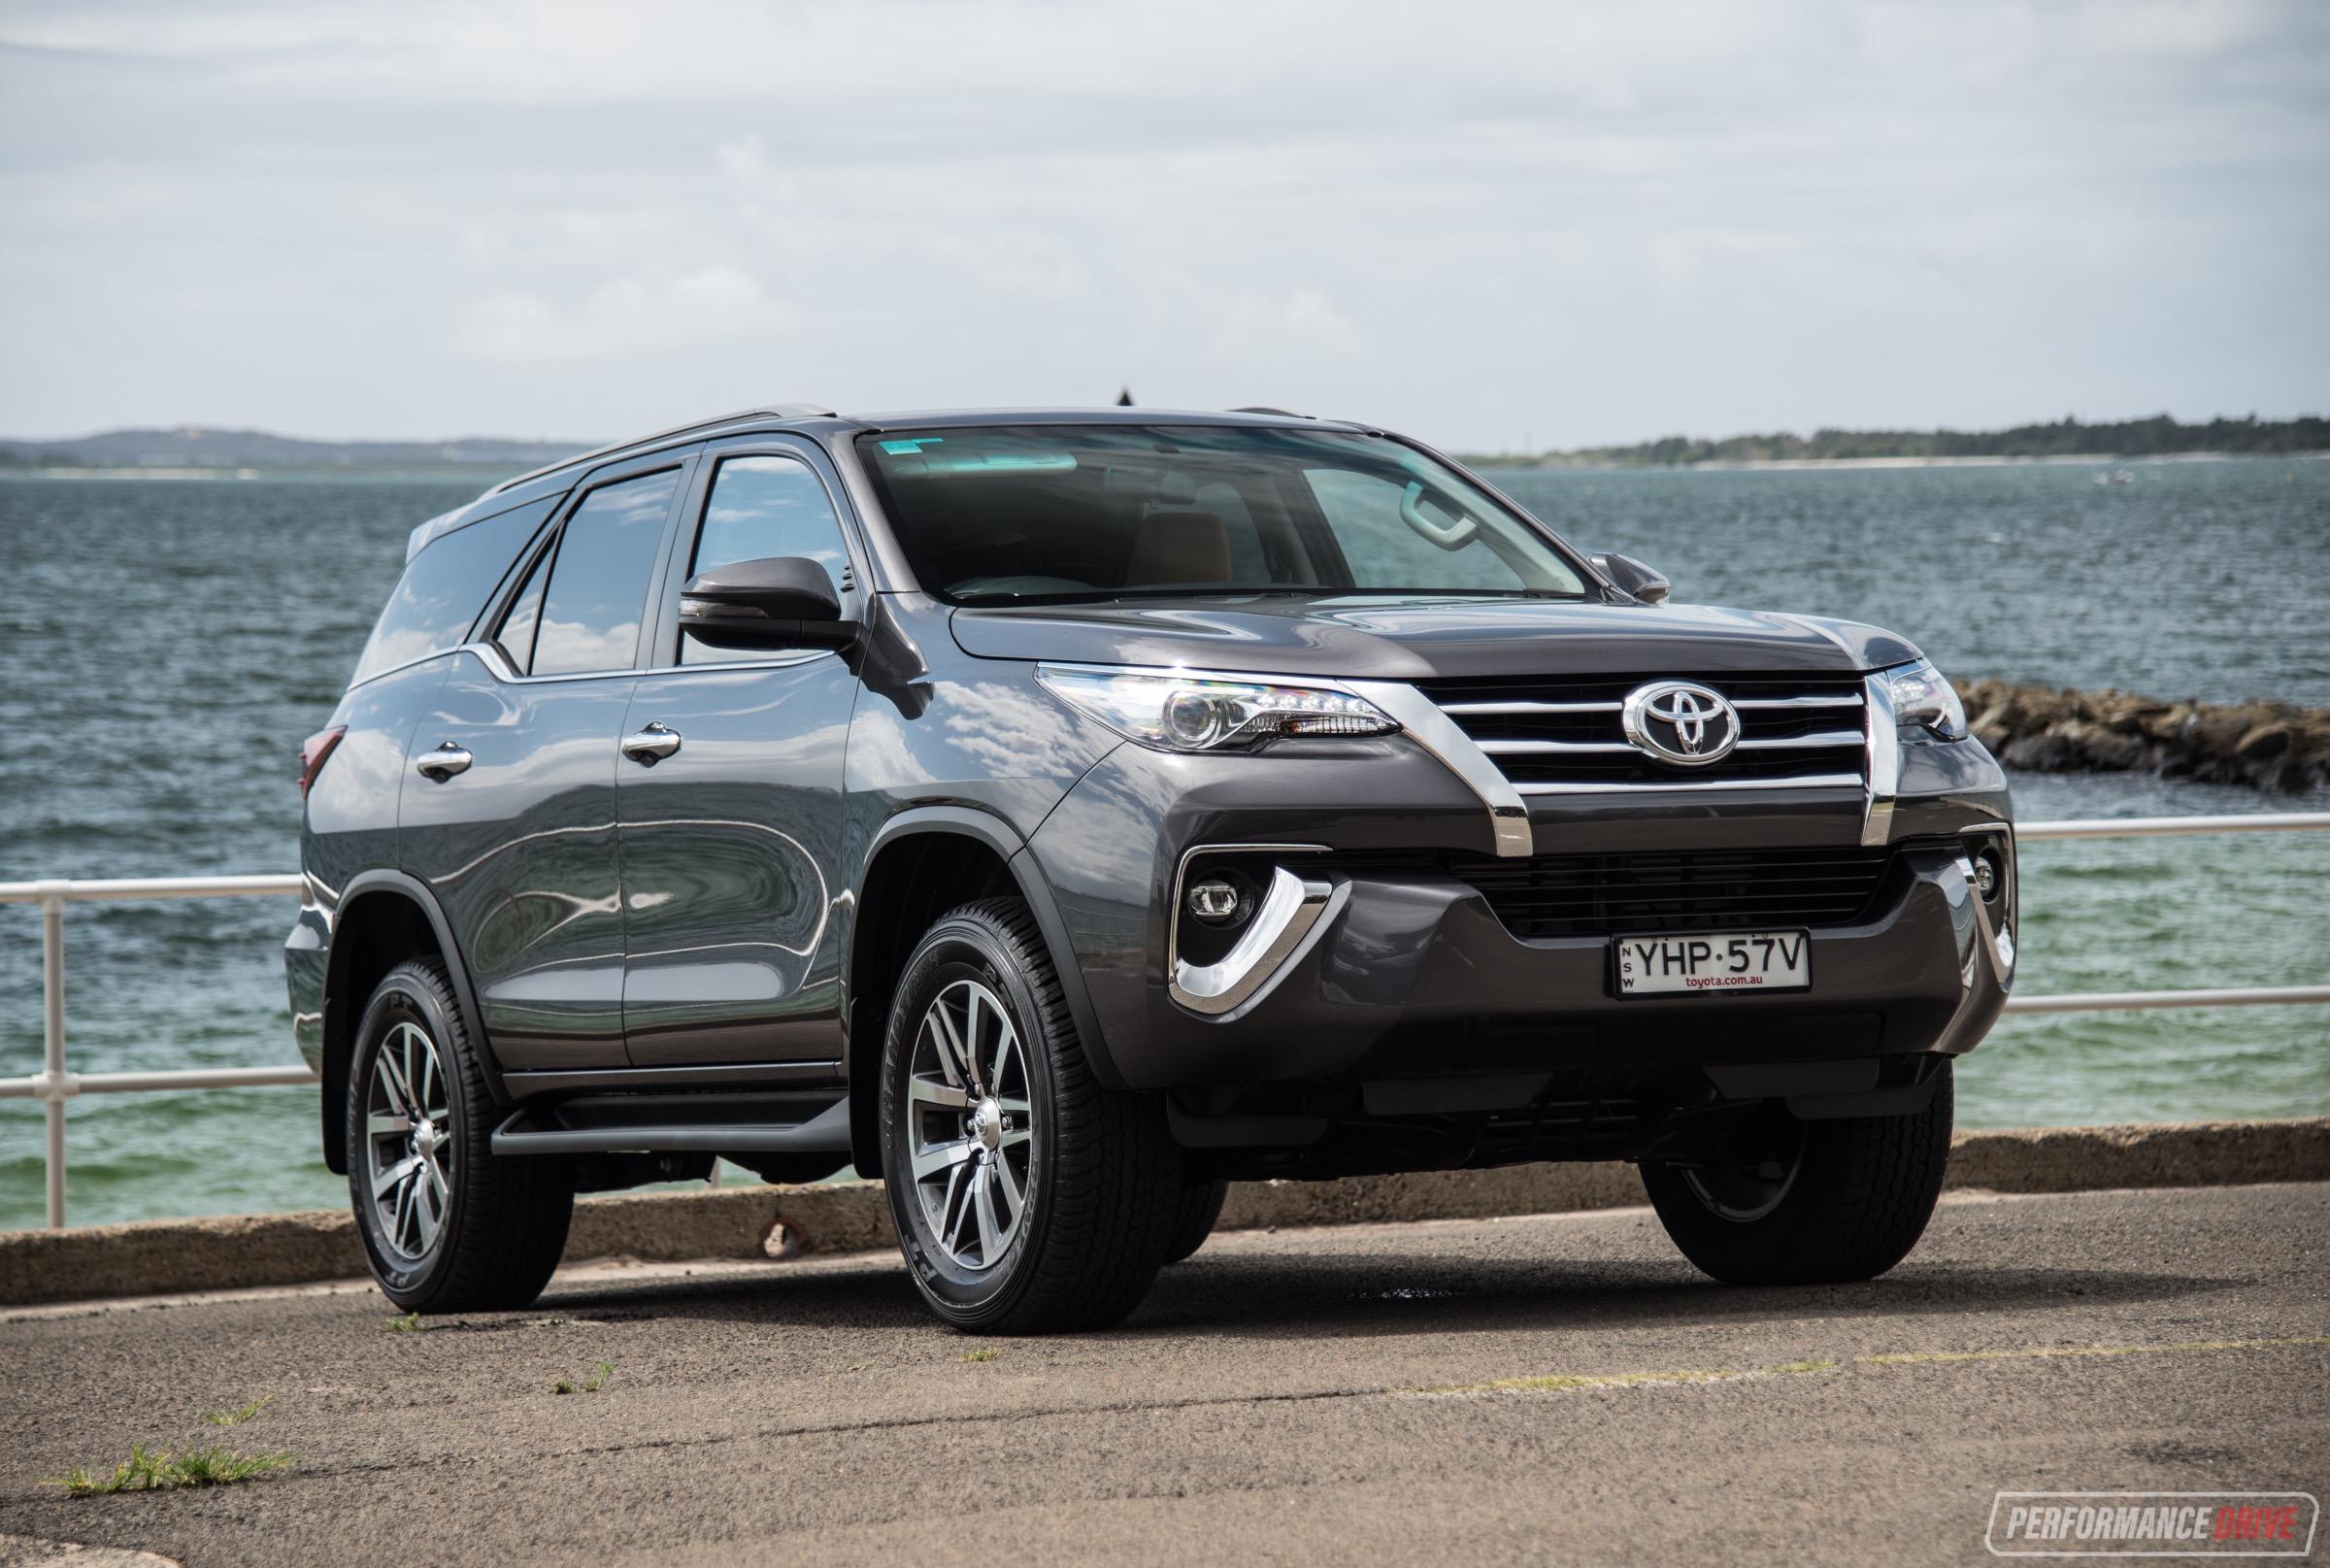 2018 Toyota Fortuner Crusade Review Video Performancedrive